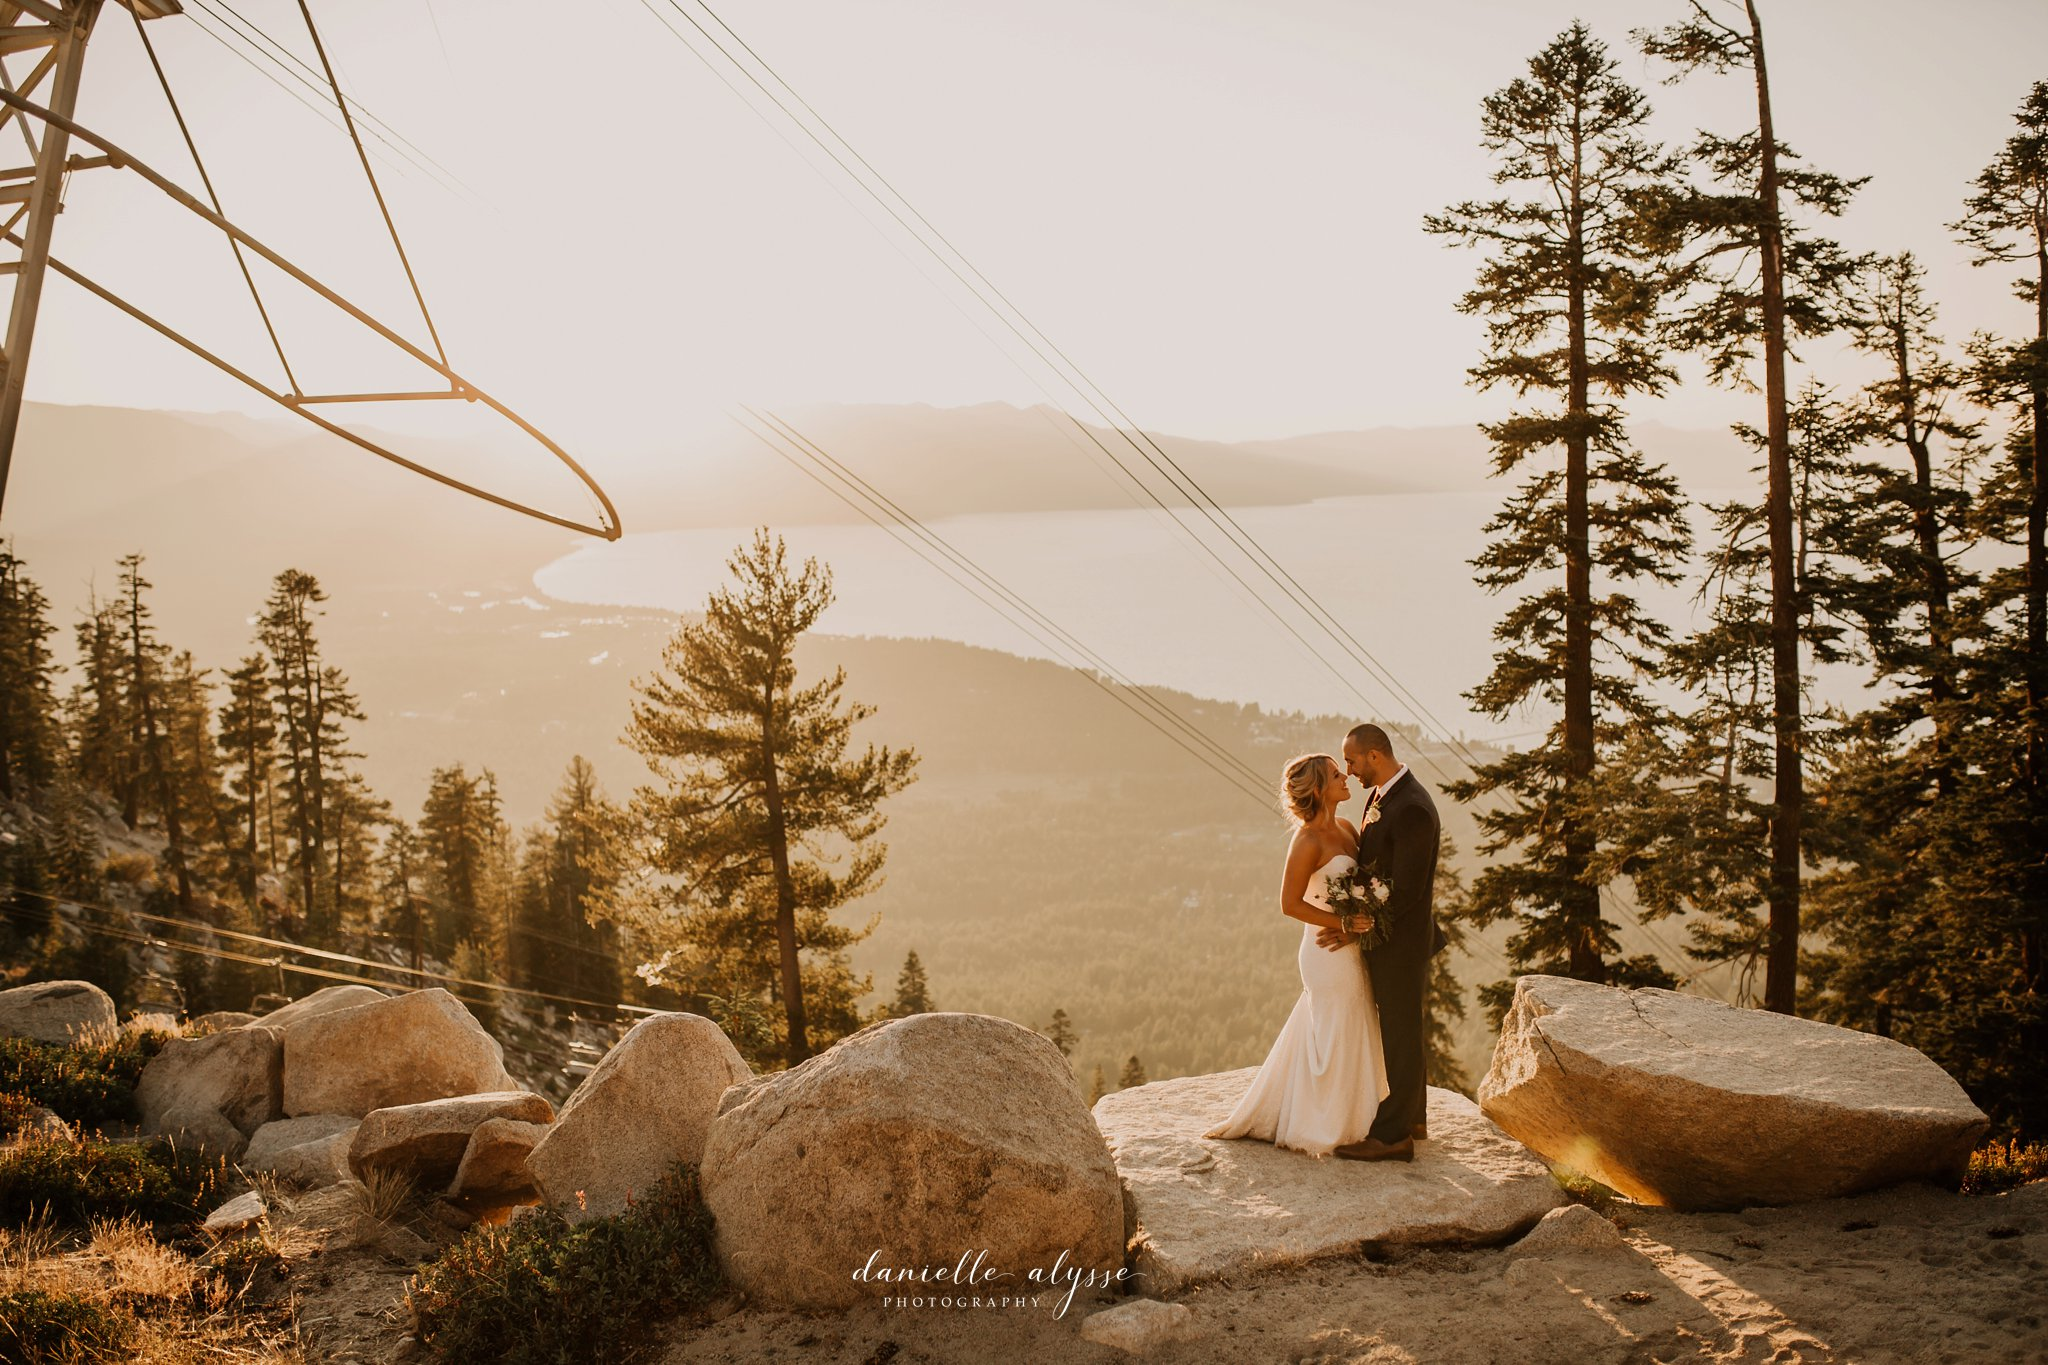 180831_wedding_stephanie_heavenly_south_lake_tahoe_danielle_alysse_photography_destination_blog_989_WEB.jpg